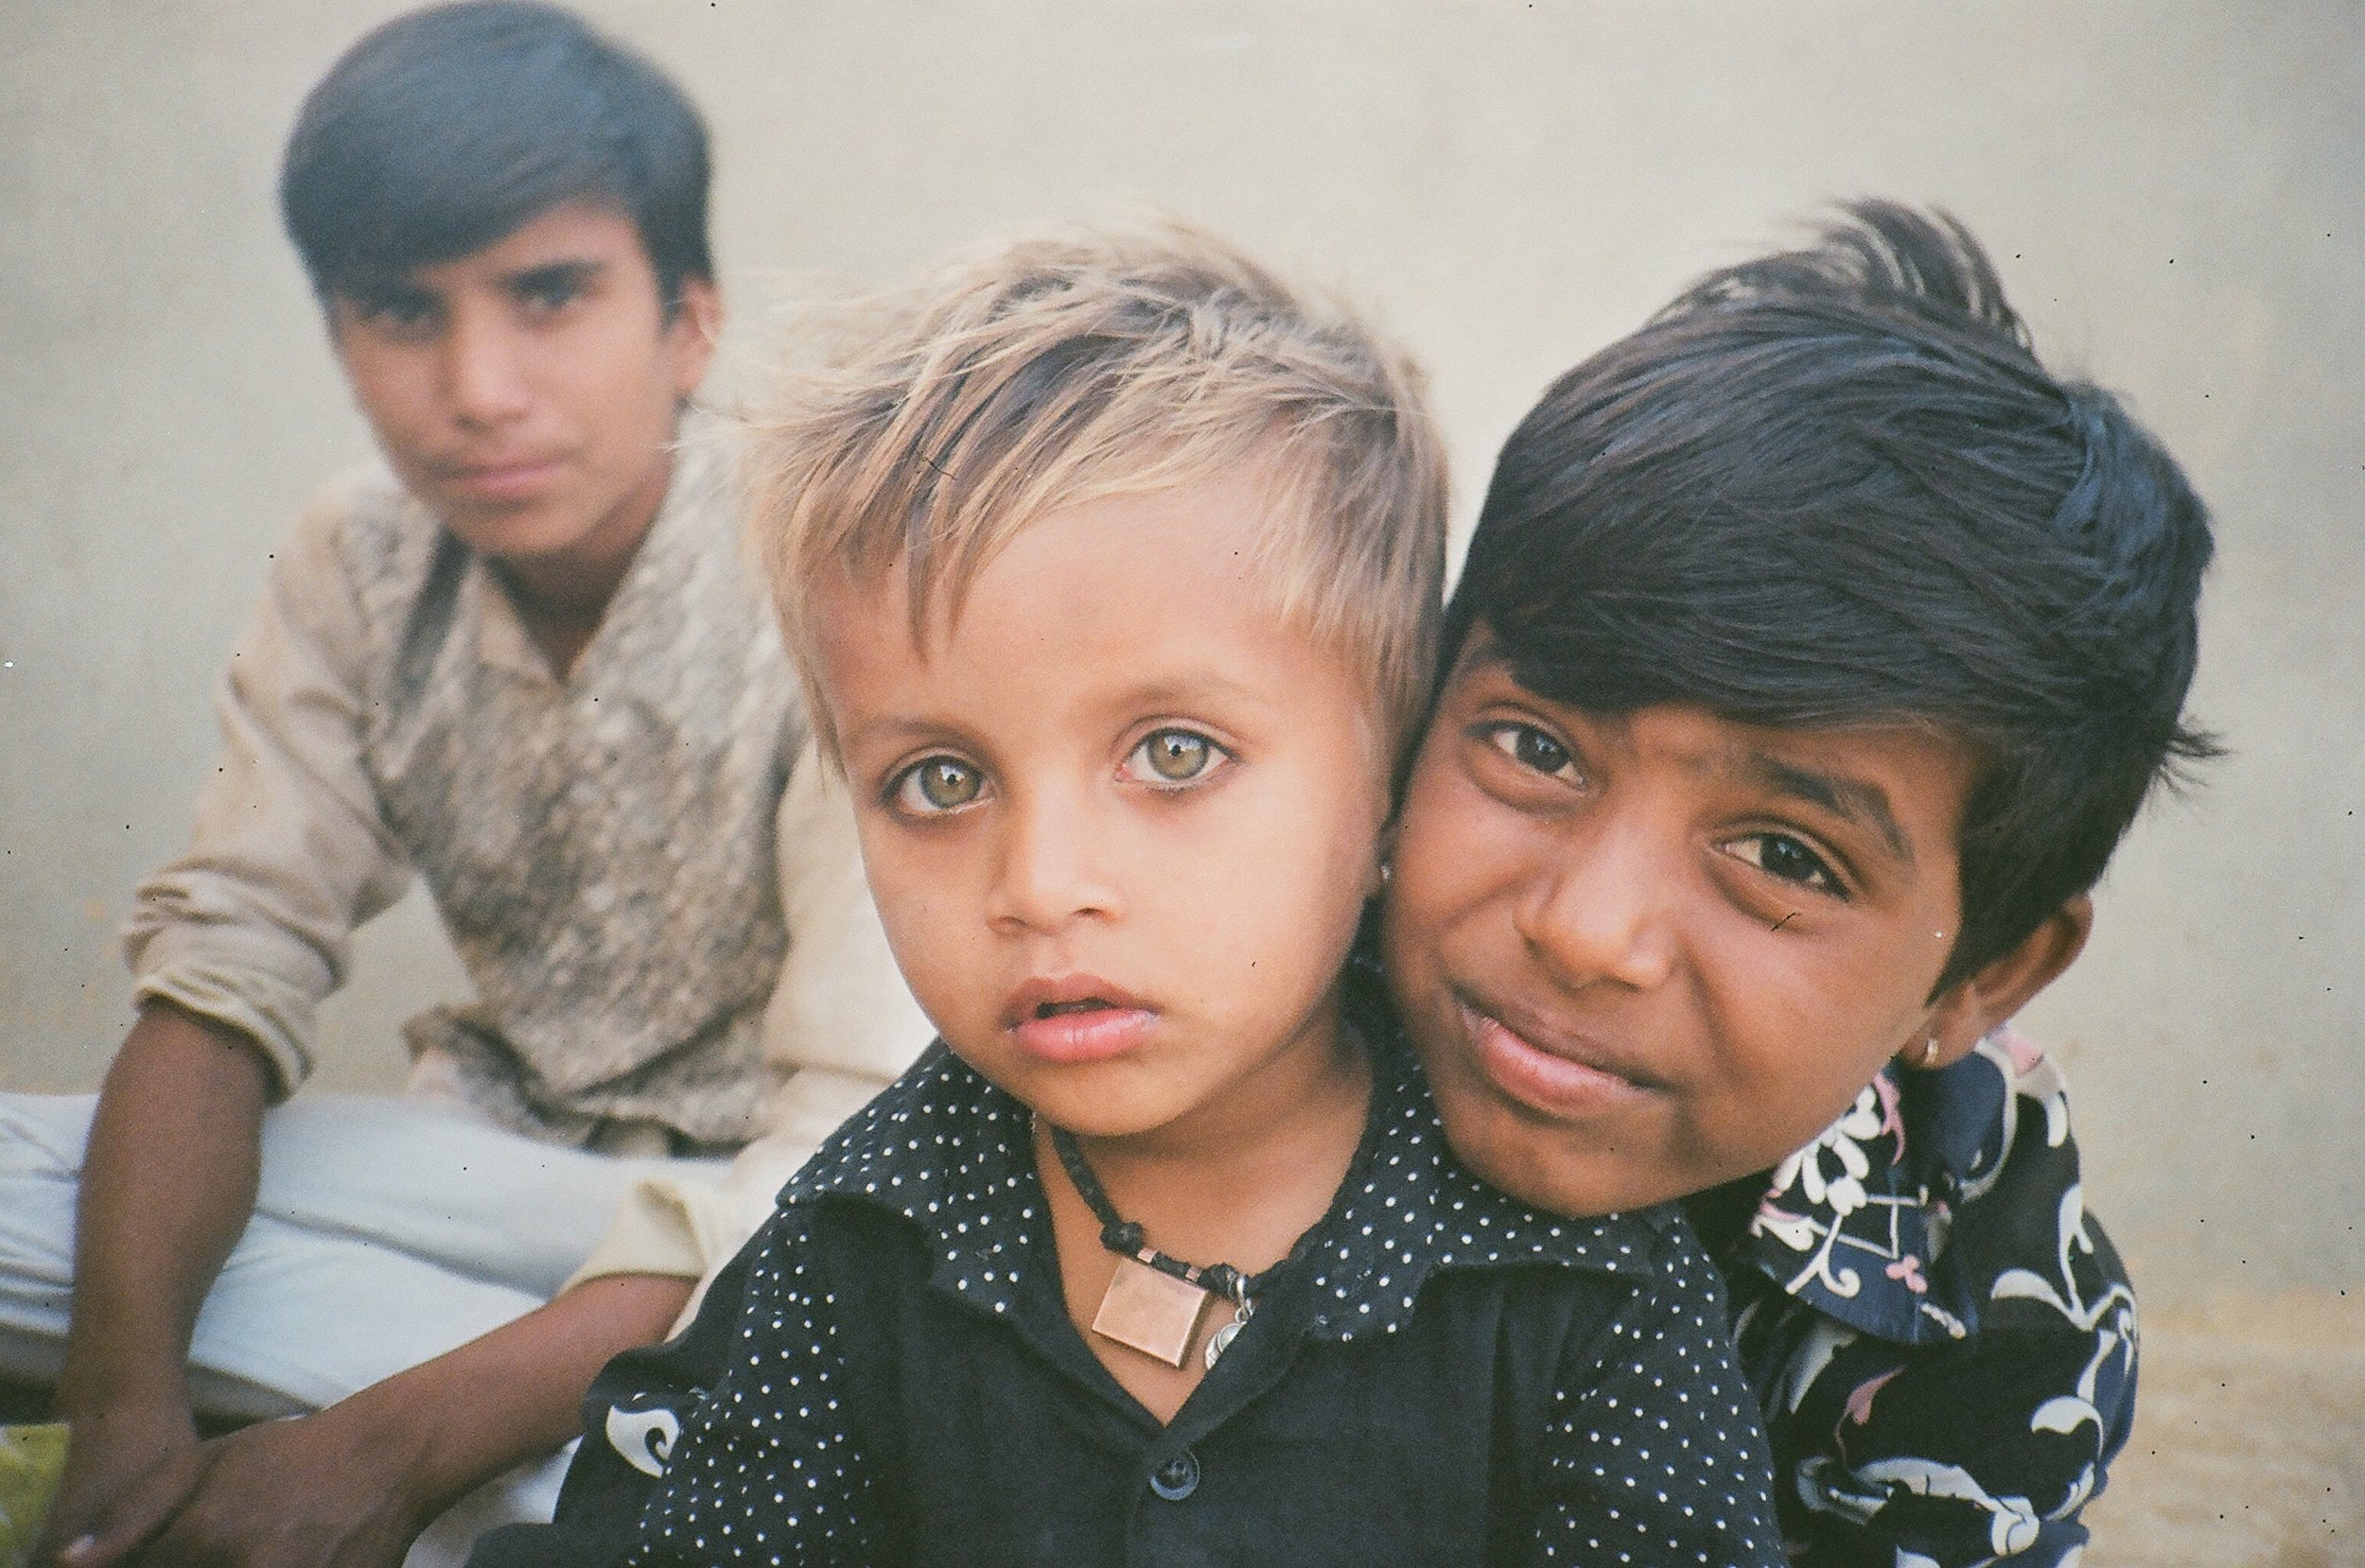 boys_Rajasthan_india.jpg